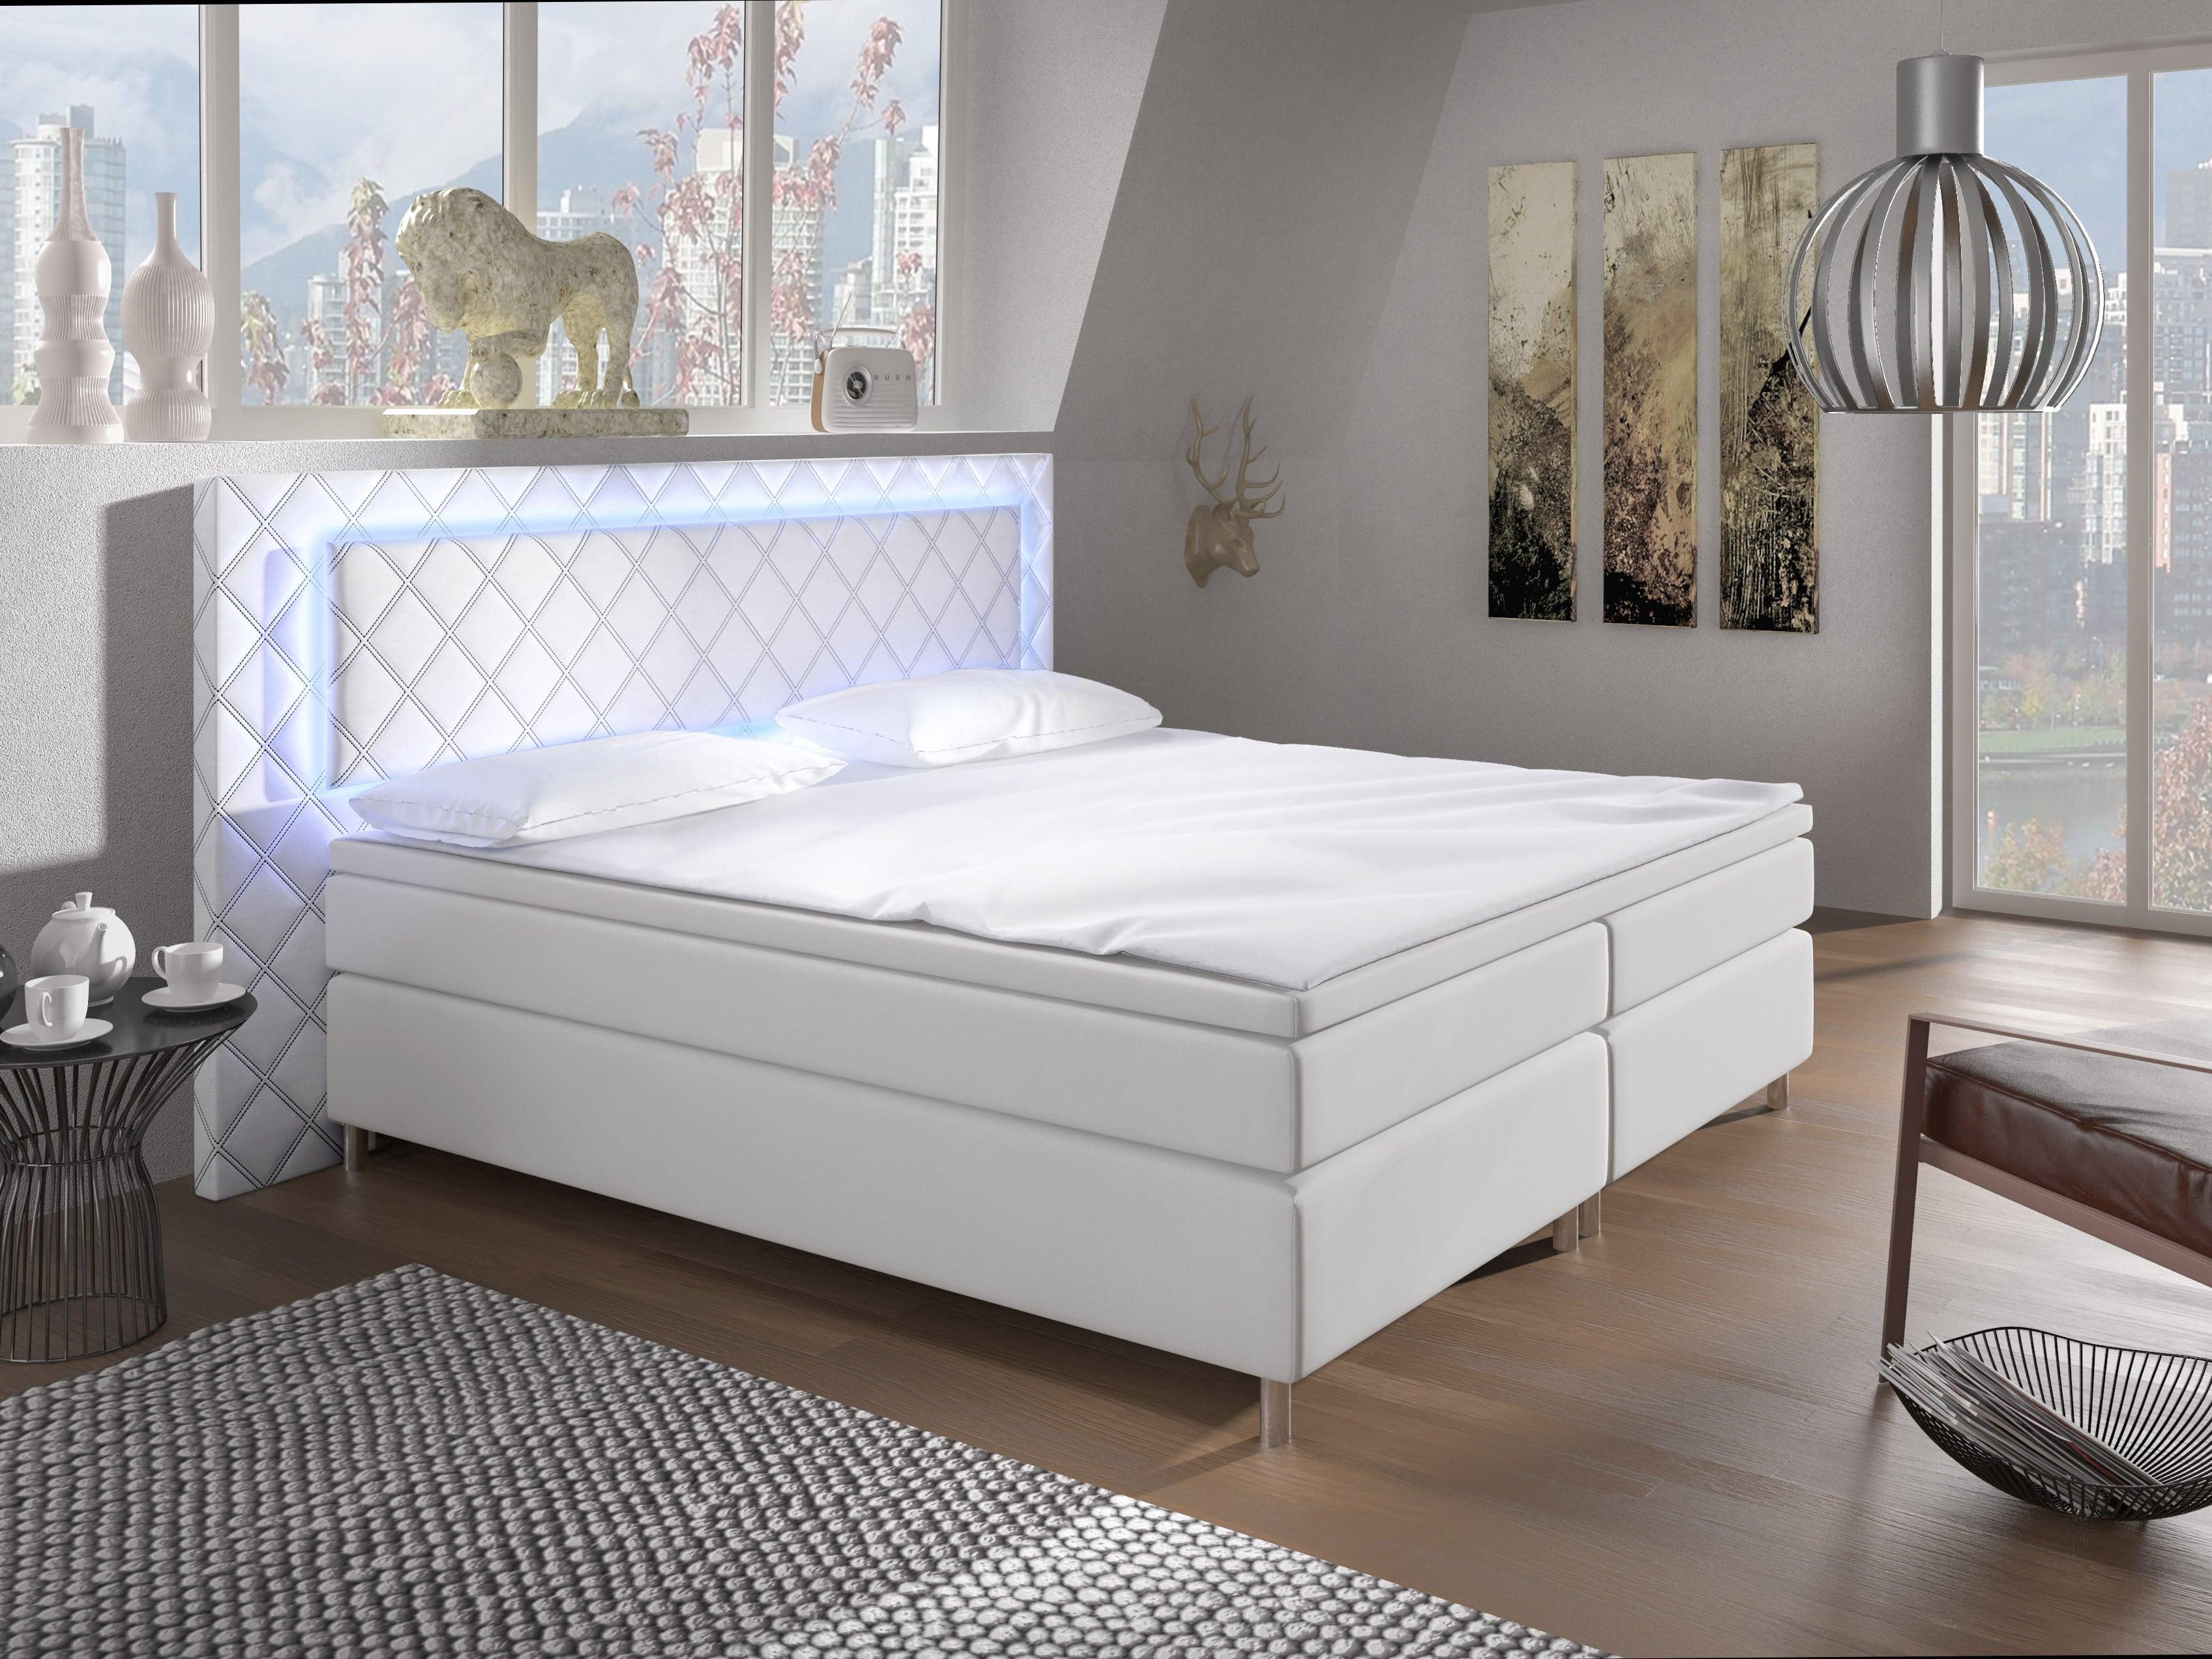 Manželská postel Boxspring 140 cm - Pius (bílá) (s matracemi)